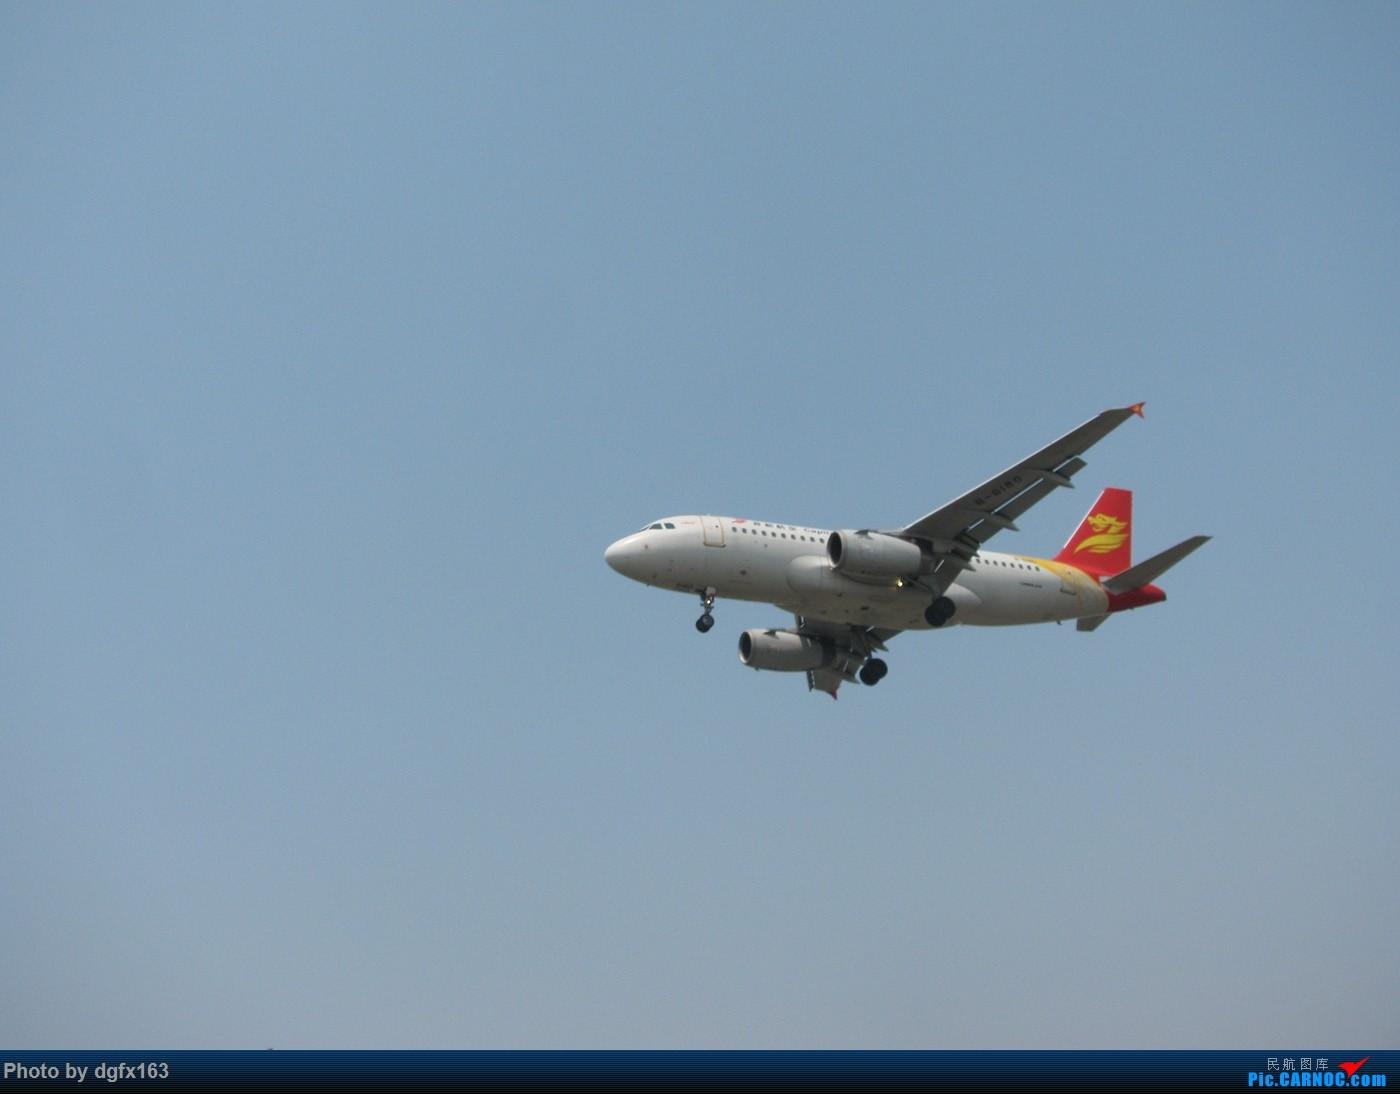 Re:[原创]【dgfx163的拍机(1)大连周水子DLC,烈日拍机1小时半。全日空、日本航空、大韩。。。还不错 AIRBUS A319-100 B-6180 中国大连周水子国际机场